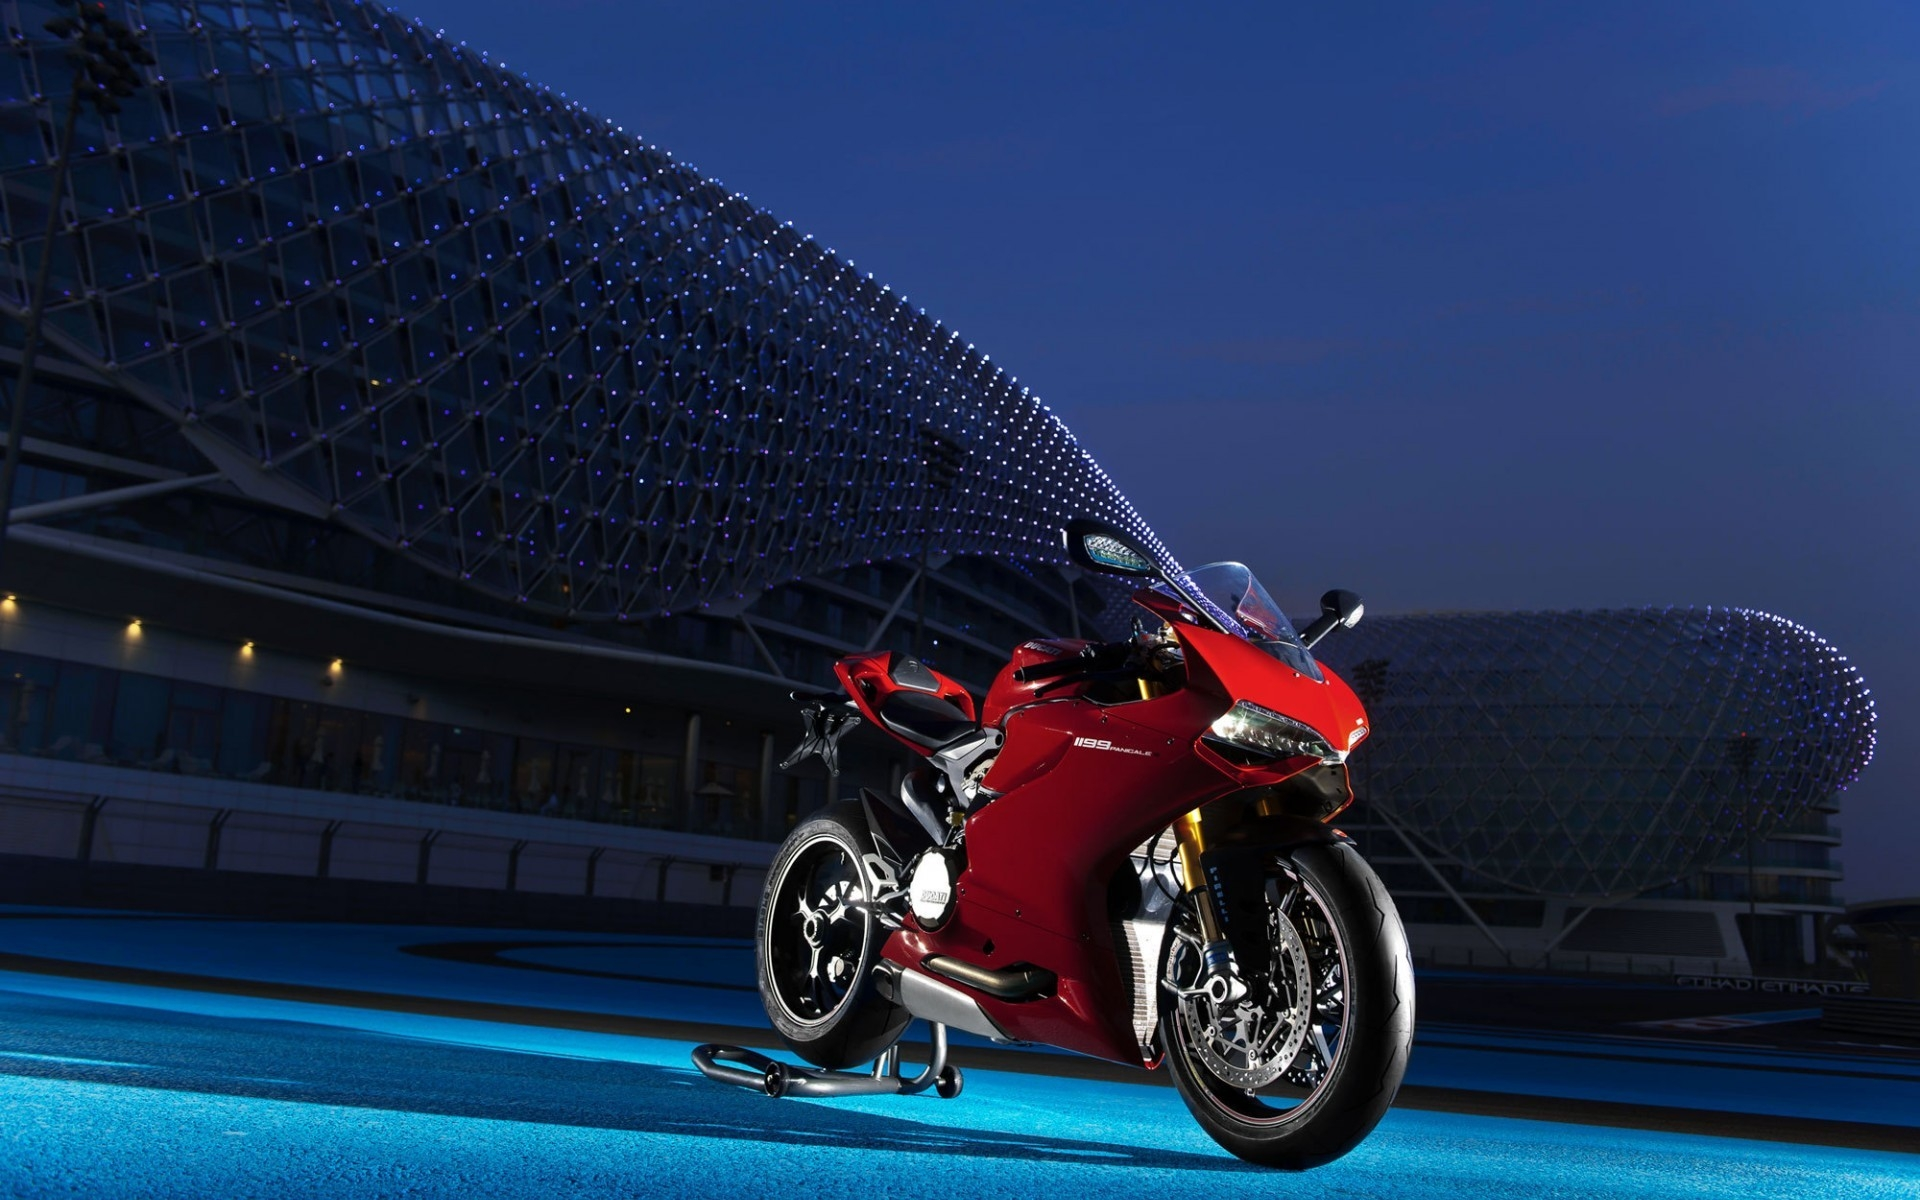 Wallpaper HD Ducati 1199 Panigale   HD Wallpaper Expert 1920x1200